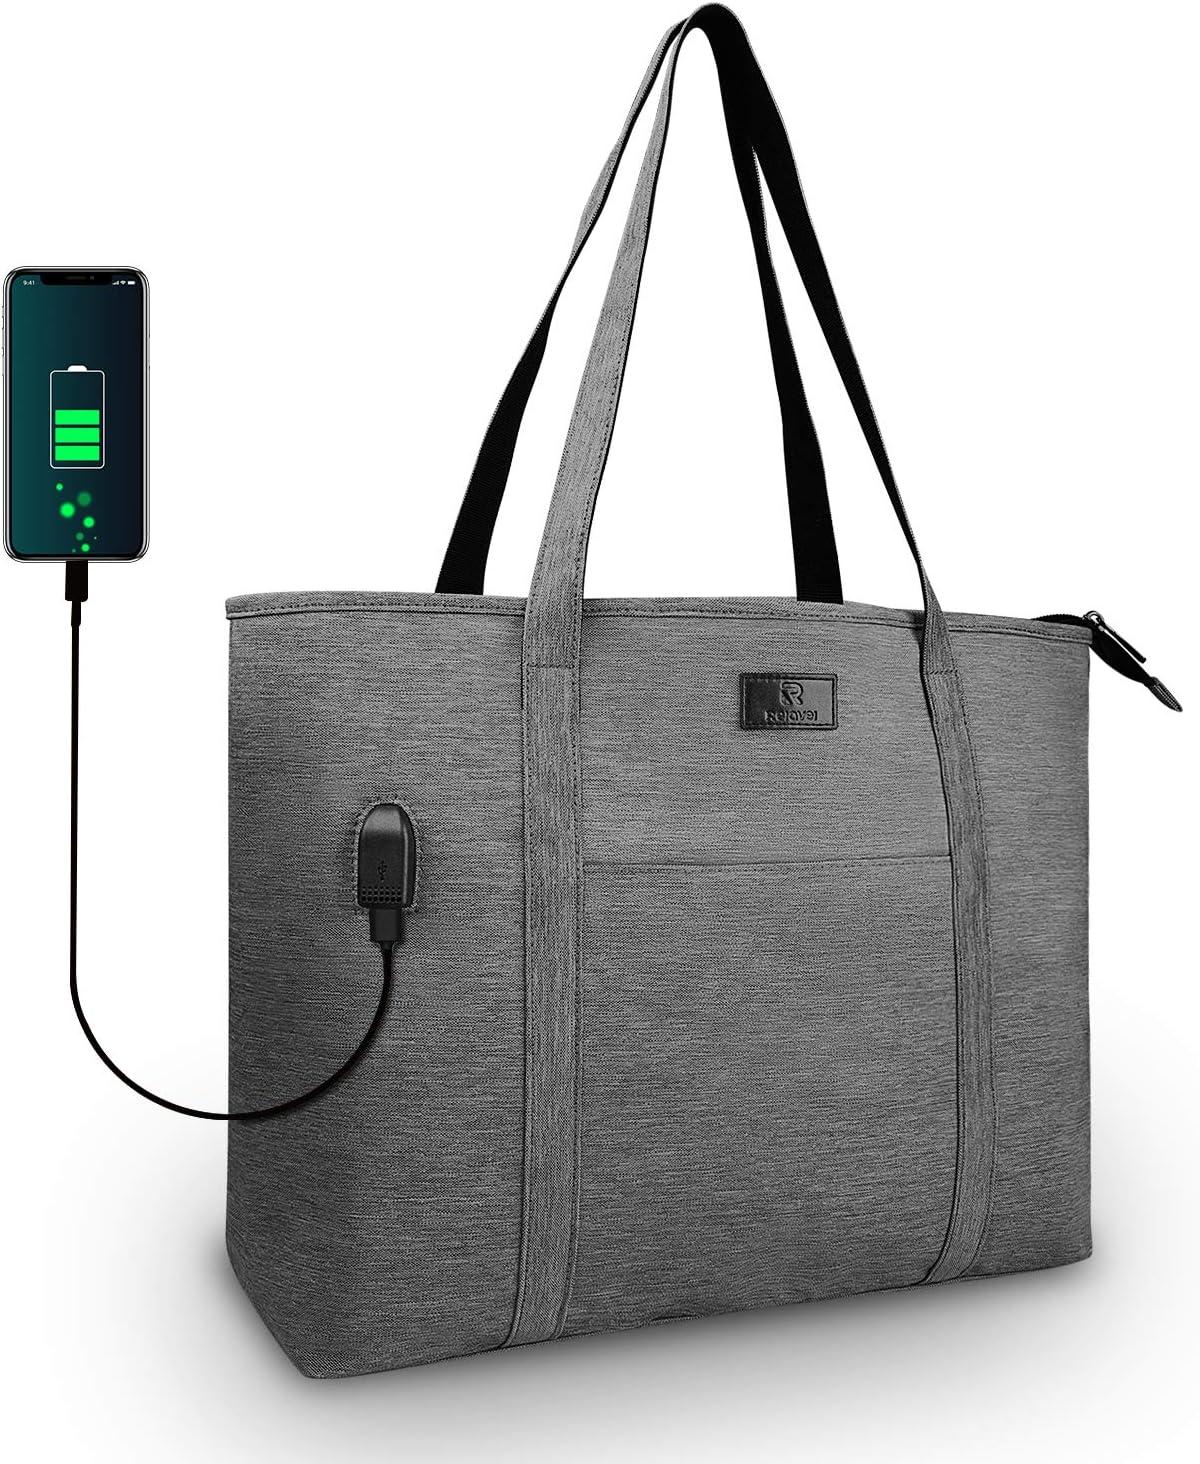 Laptop Tote Bag Large Work Bag Teacher Purse Fits 15 Inch Laptop USB Port